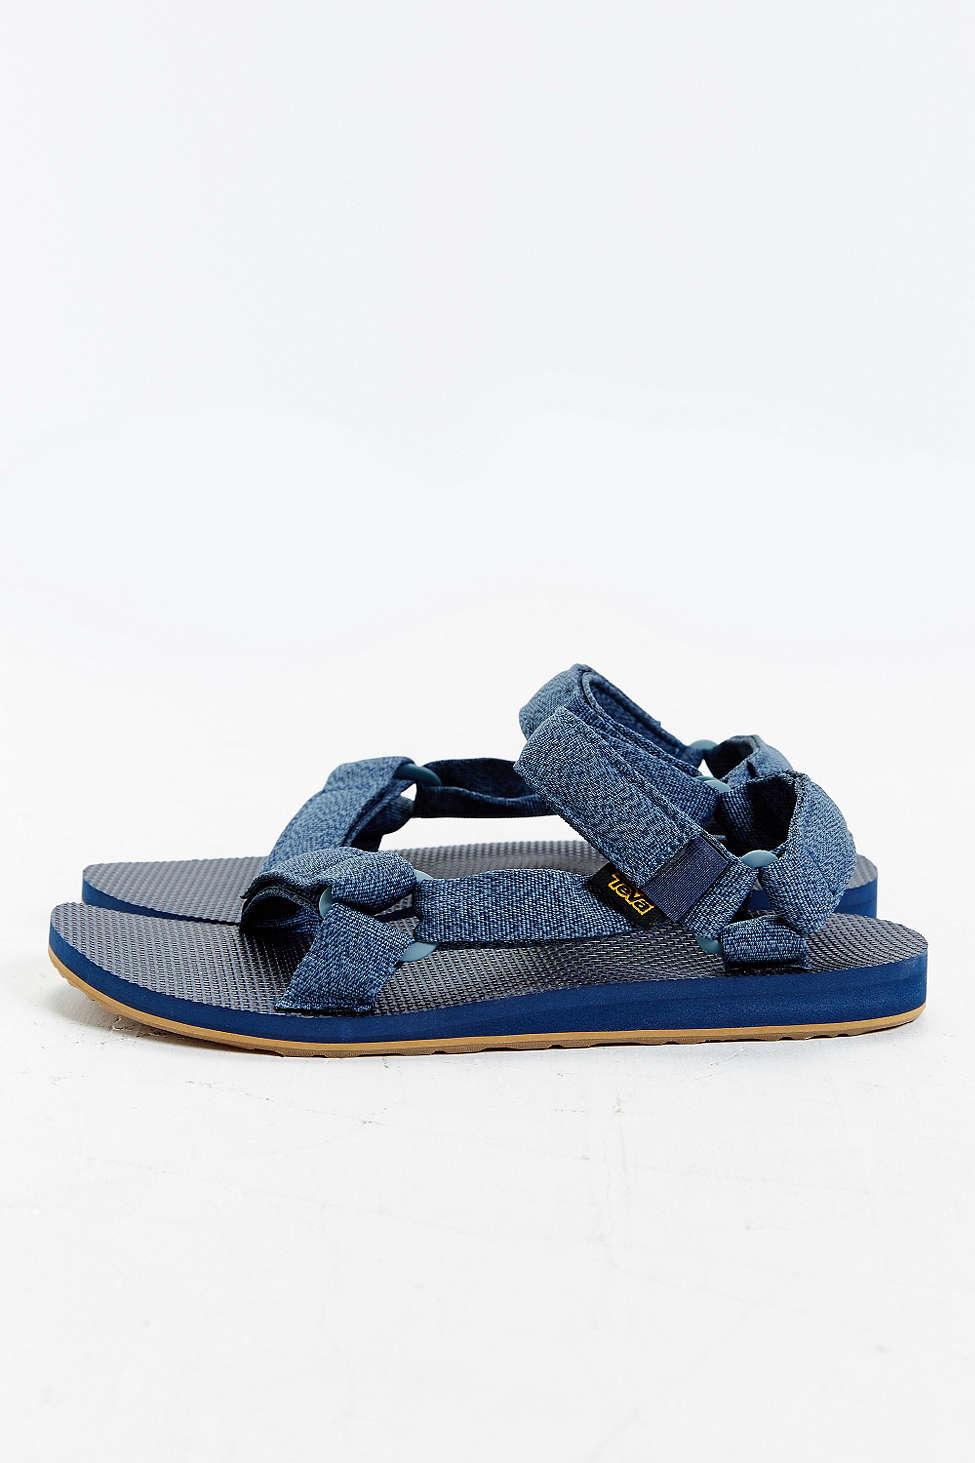 2d6c382fda0b3c Lyst - Teva Original Universal Marbled Sandal in Blue for Men